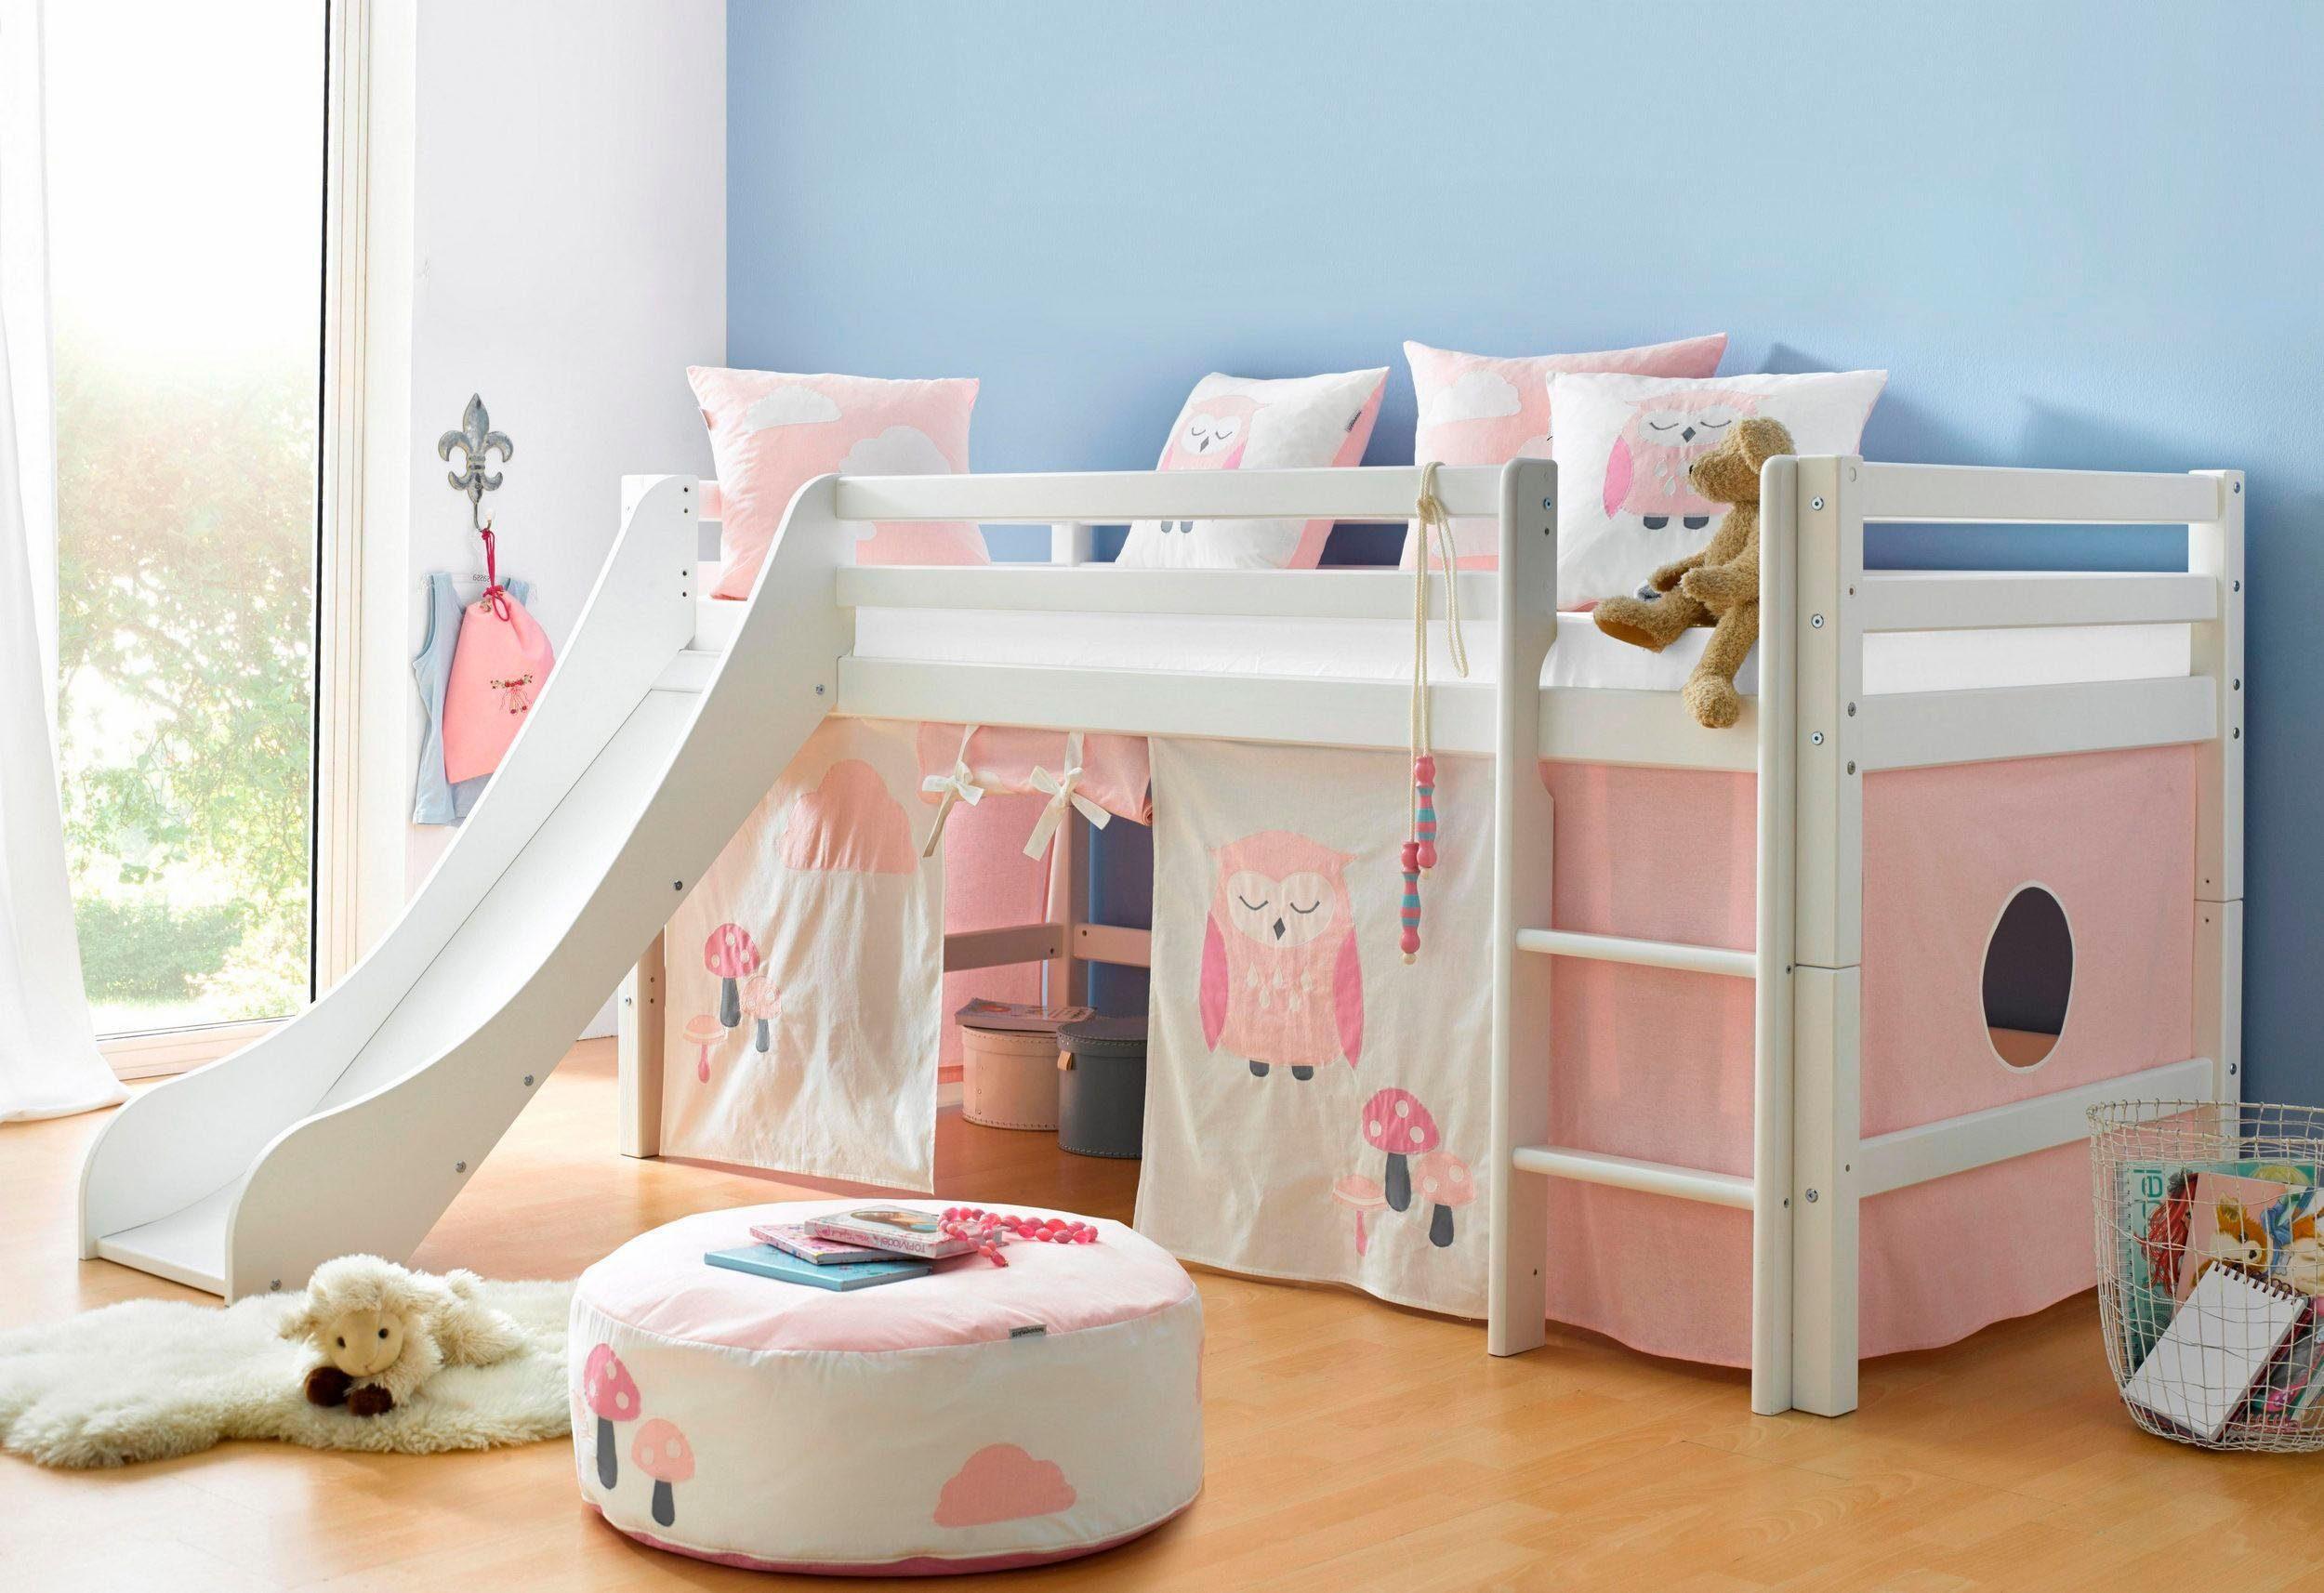 Etagenbett Drei Kinder : Etagenbett doppelstockbett online kaufen stockbett otto